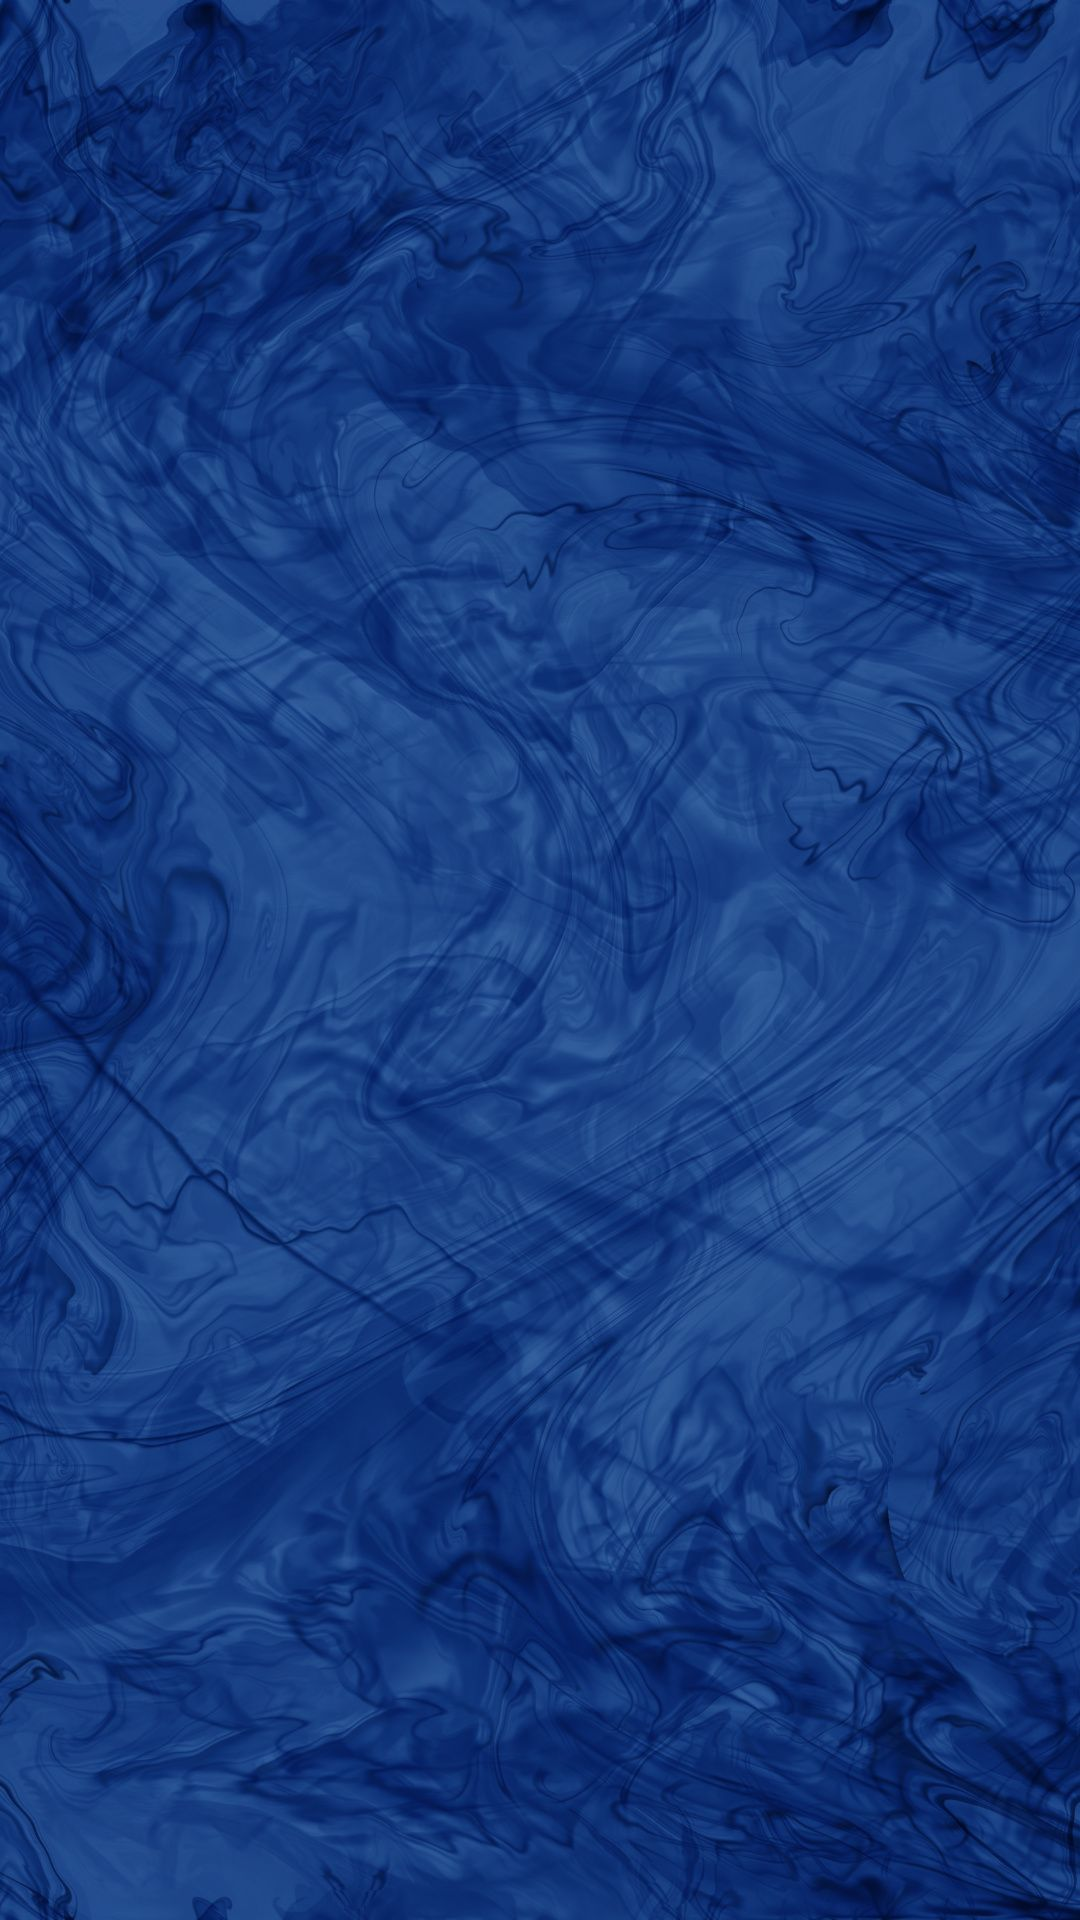 Blue Texture Granite Smoke Wallpaper Smoke Wallpaper Textured Wallpaper Blue Wallpapers